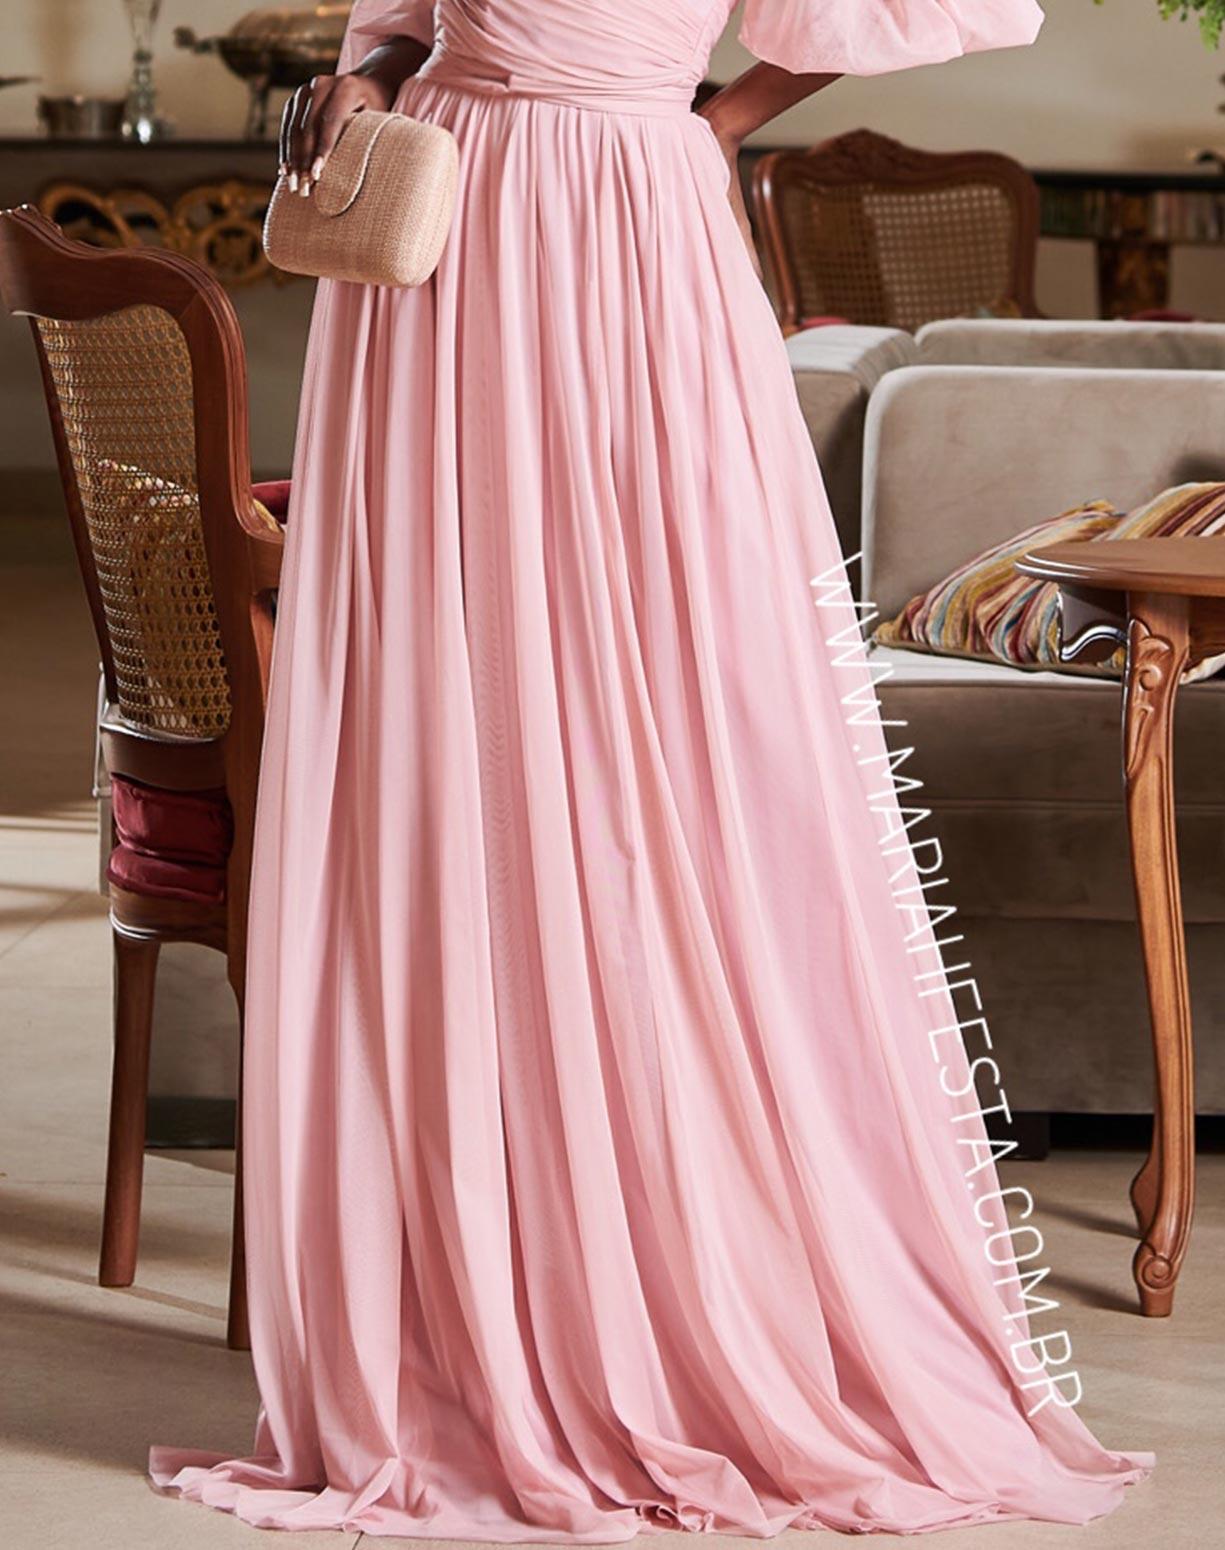 Vestido Rosê em Tule com Manga Ombro a Ombro